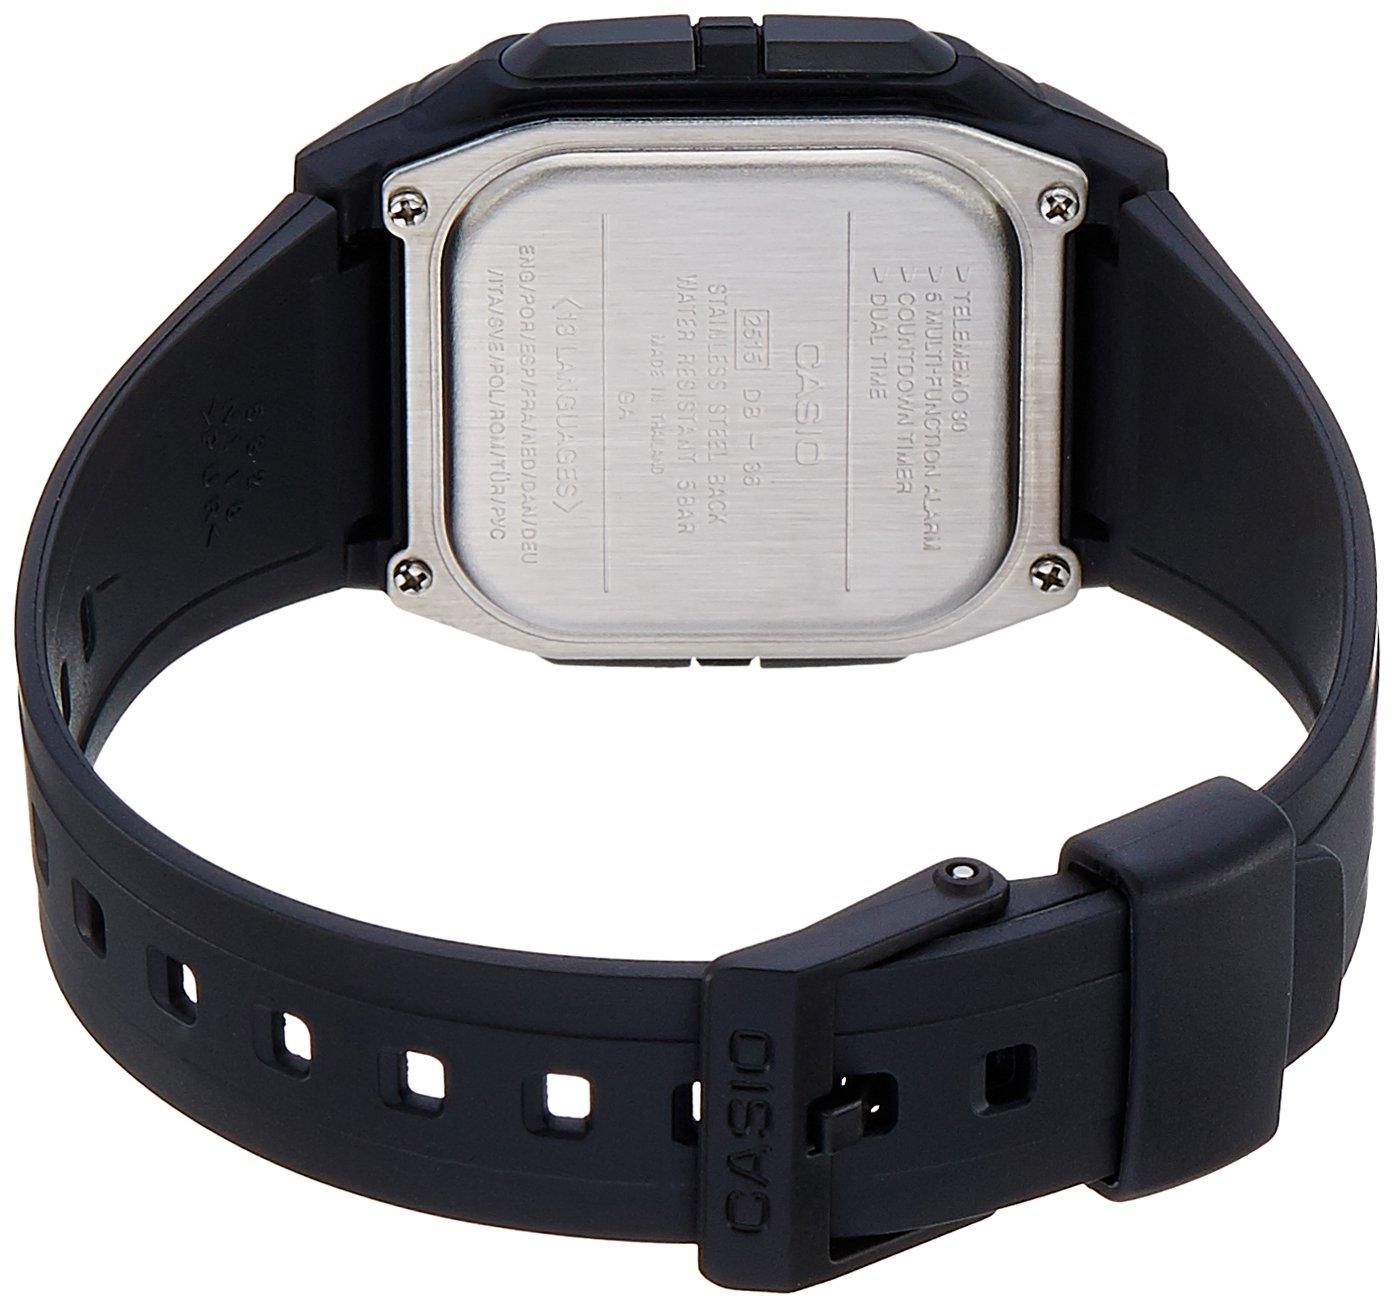 acb582496 Relógio Masculino Digital Casio Data Bank DB-36-1AV - Preto  Amazon.com.br   Amazon Moda